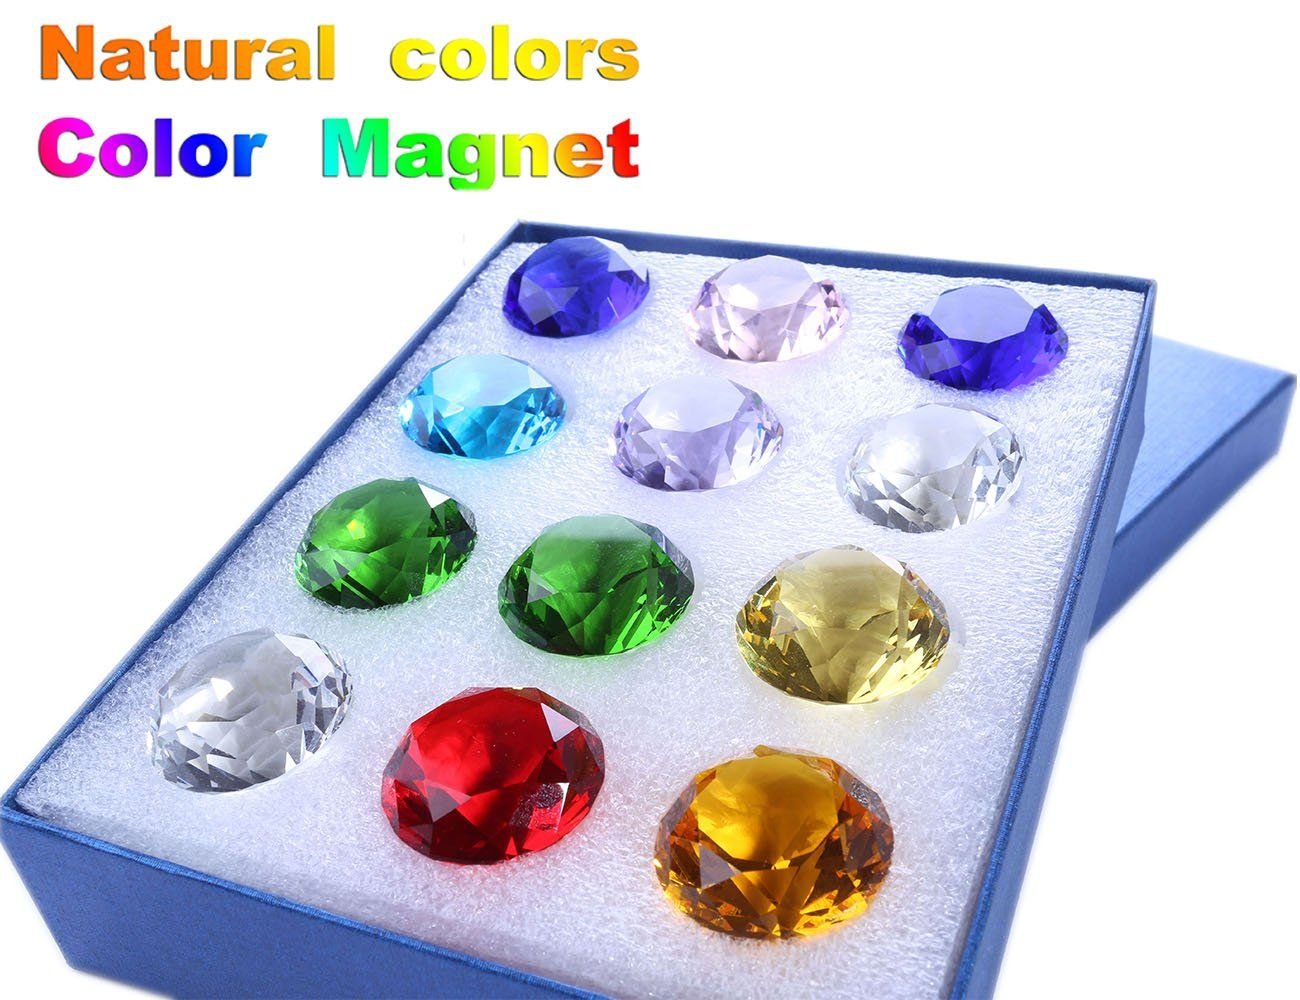 Glass Diamond Crystal Pirate Gems and Jewels